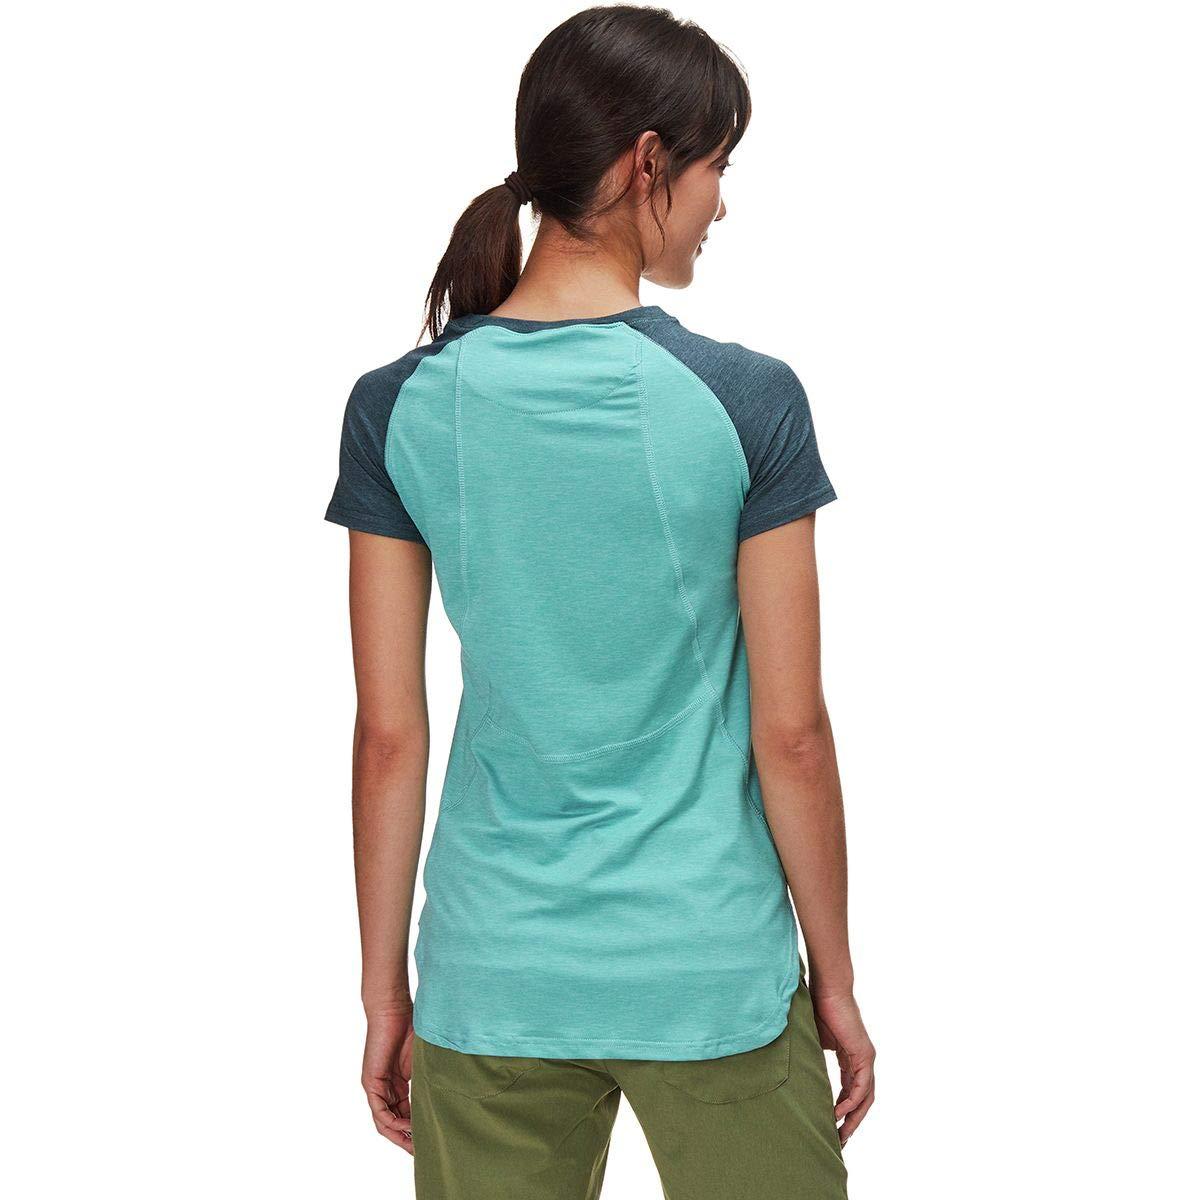 Womens FlyLow Gear Jessi Shirt 13290